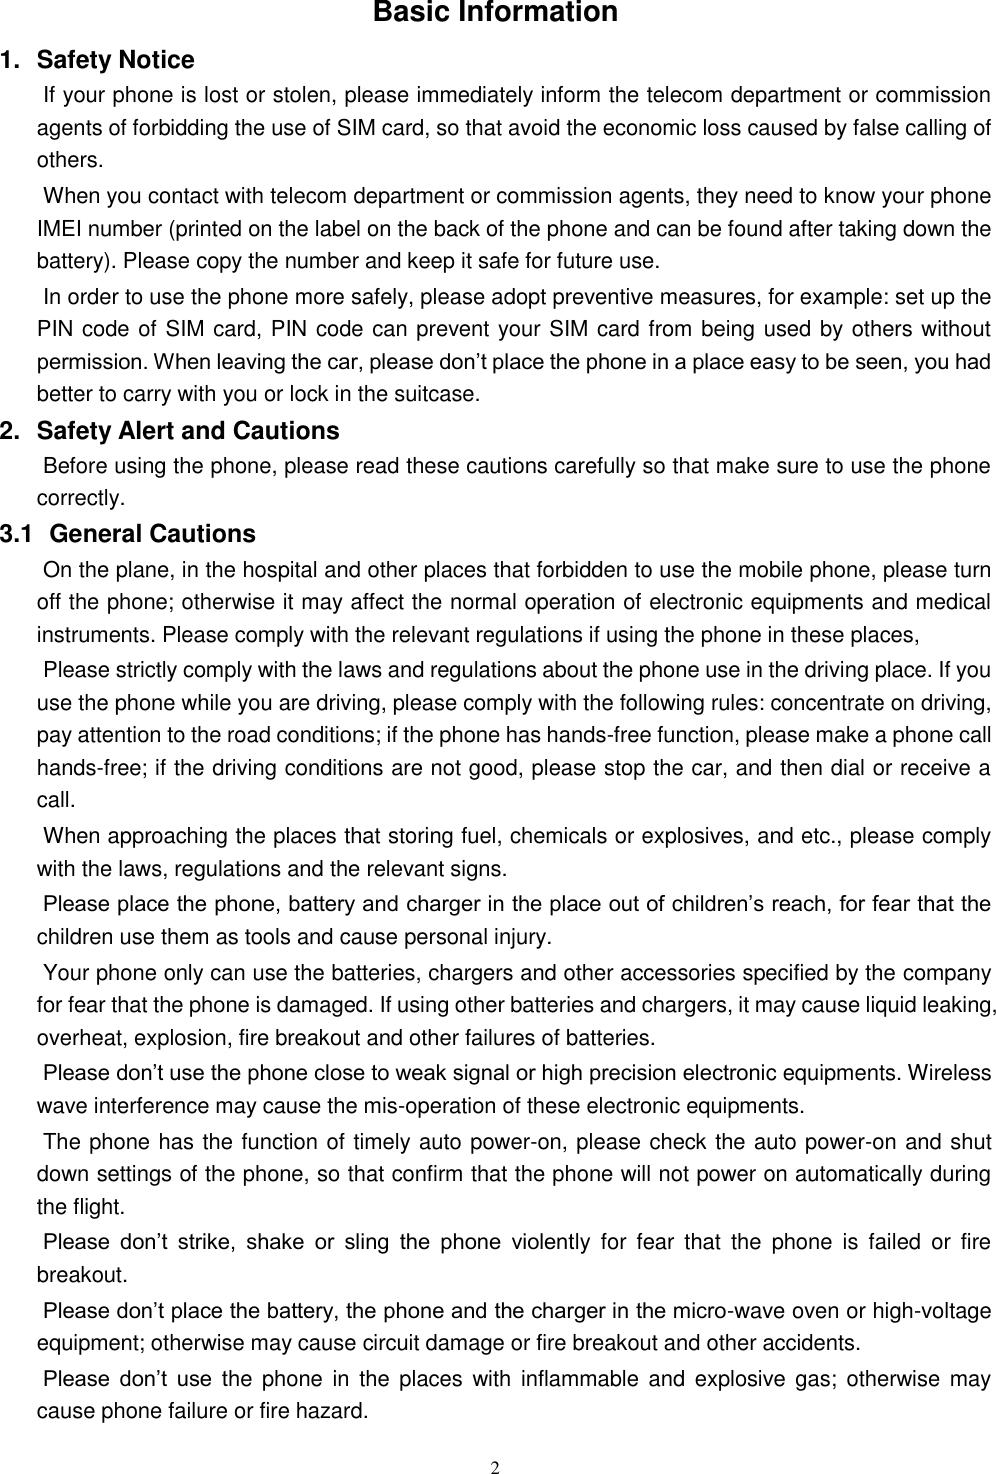 XTR C X4 Smartphone User Manual